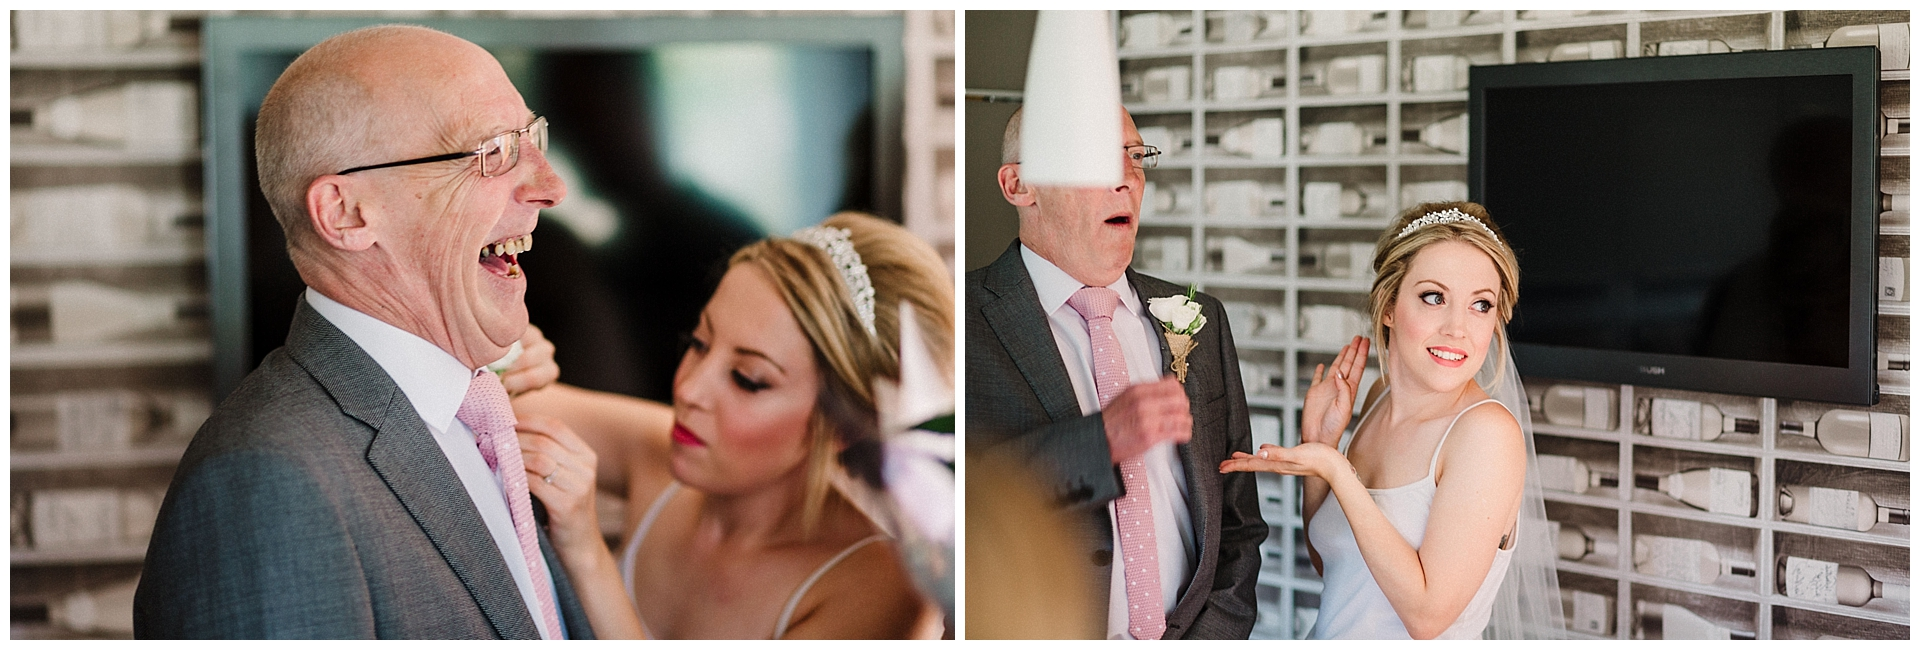 bridal prep wedding photos leeds.jpg